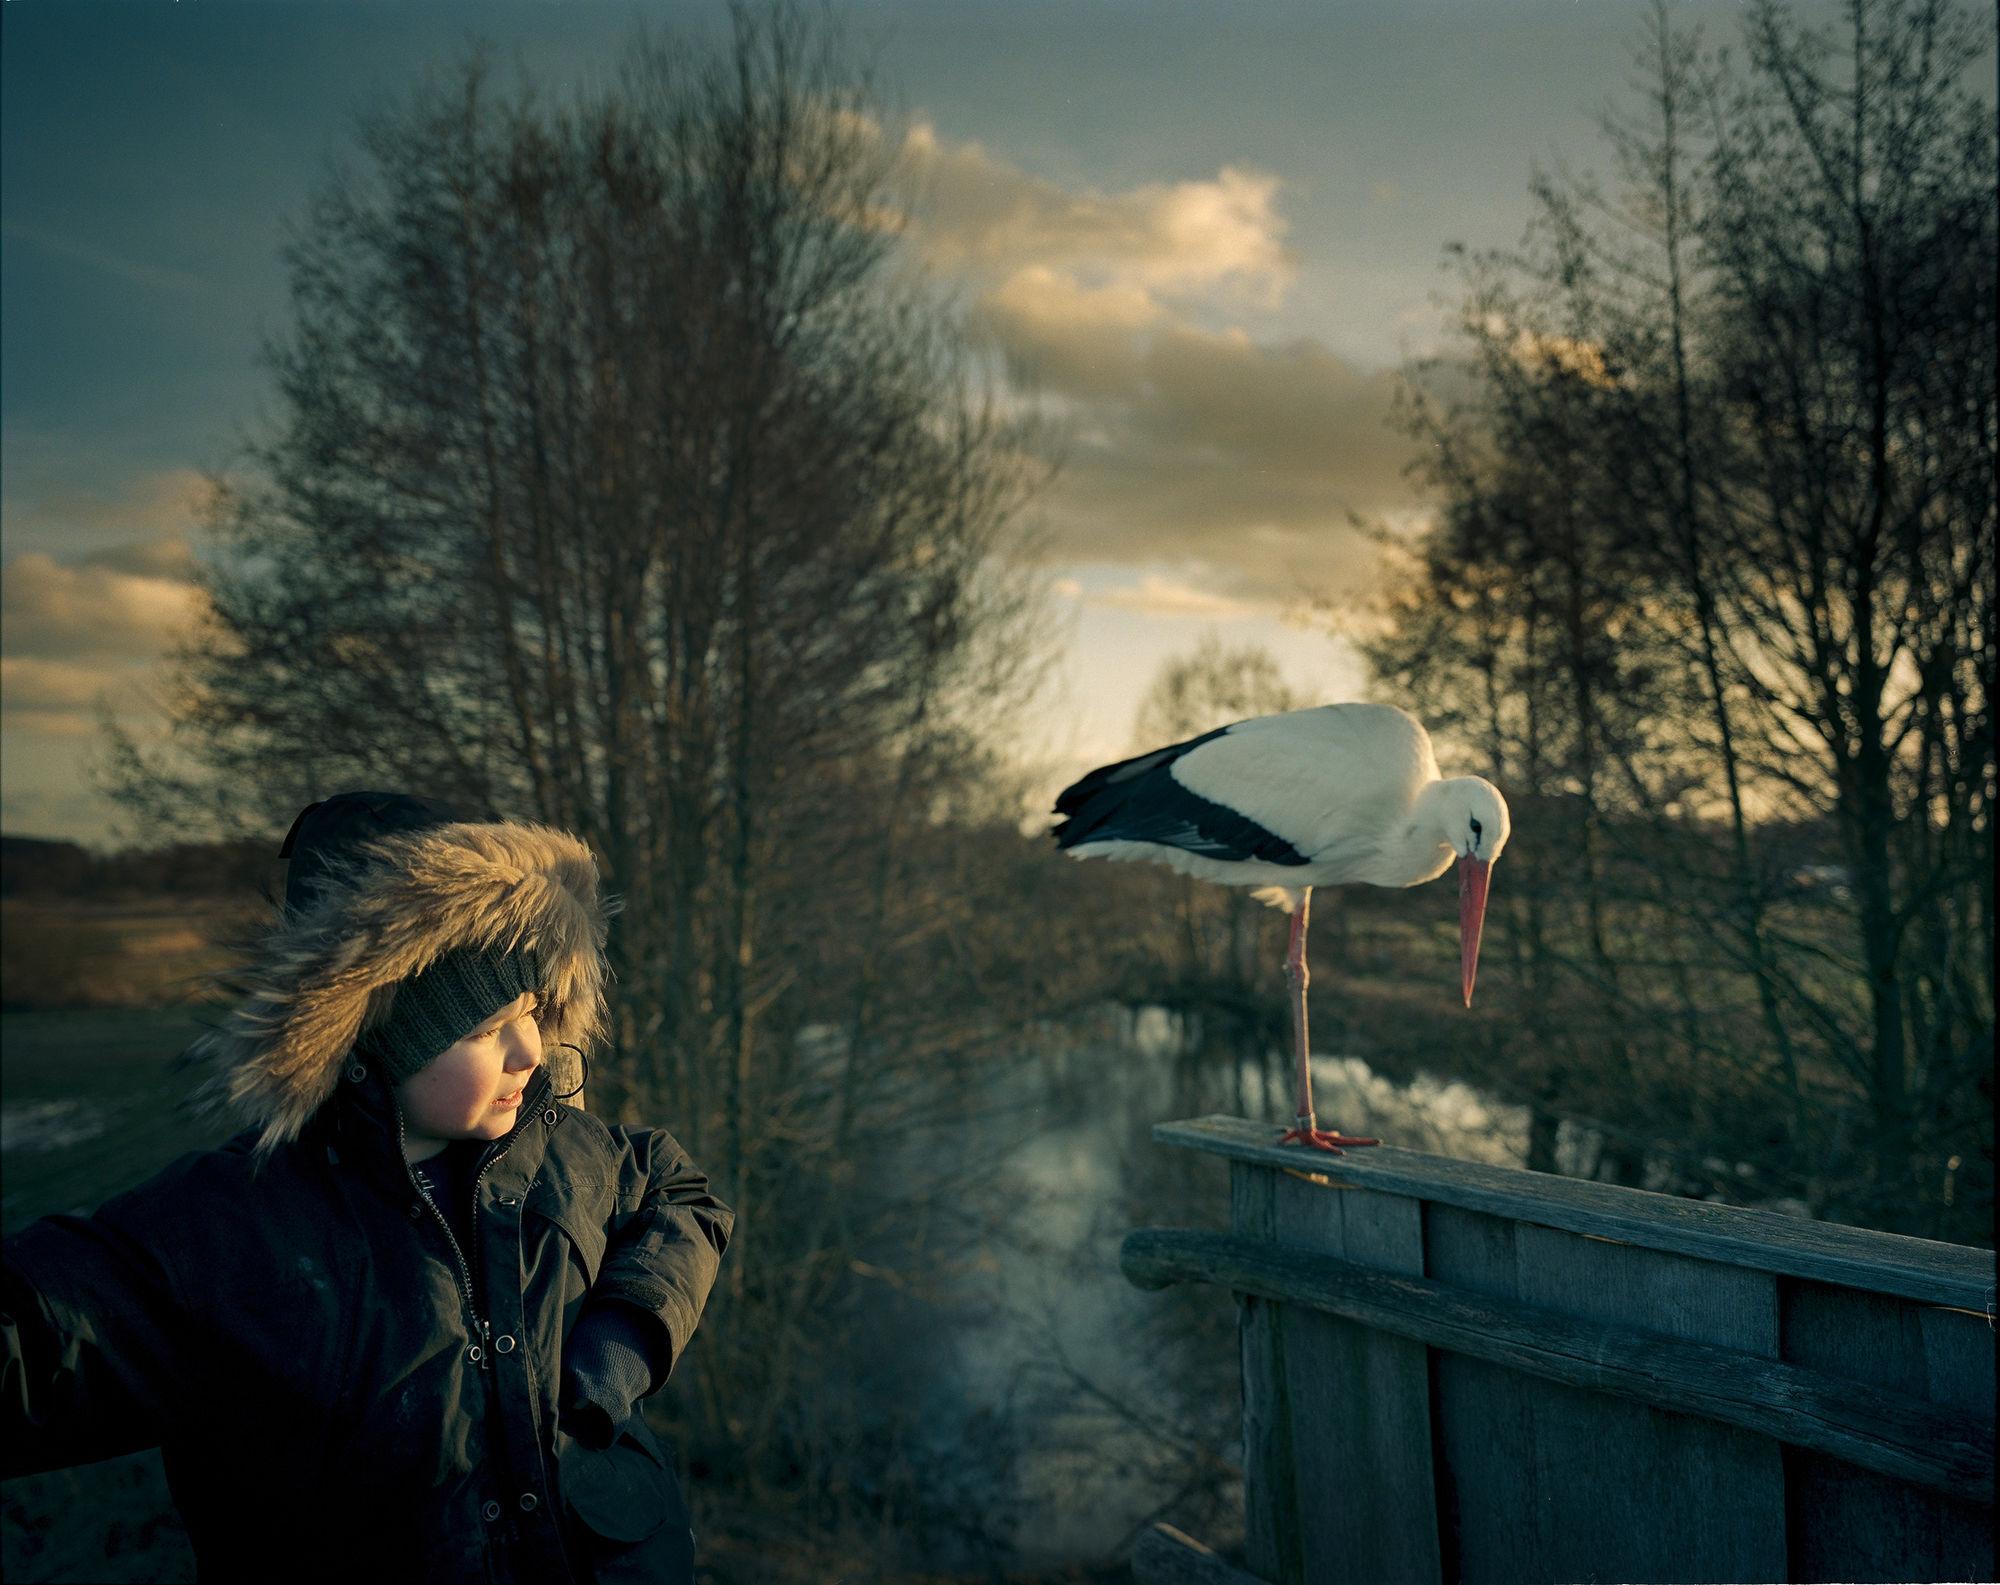 THE HELSINKI SCHOOL THE NATURE OF BEING, VOL 6  : Joakim Eskildsen